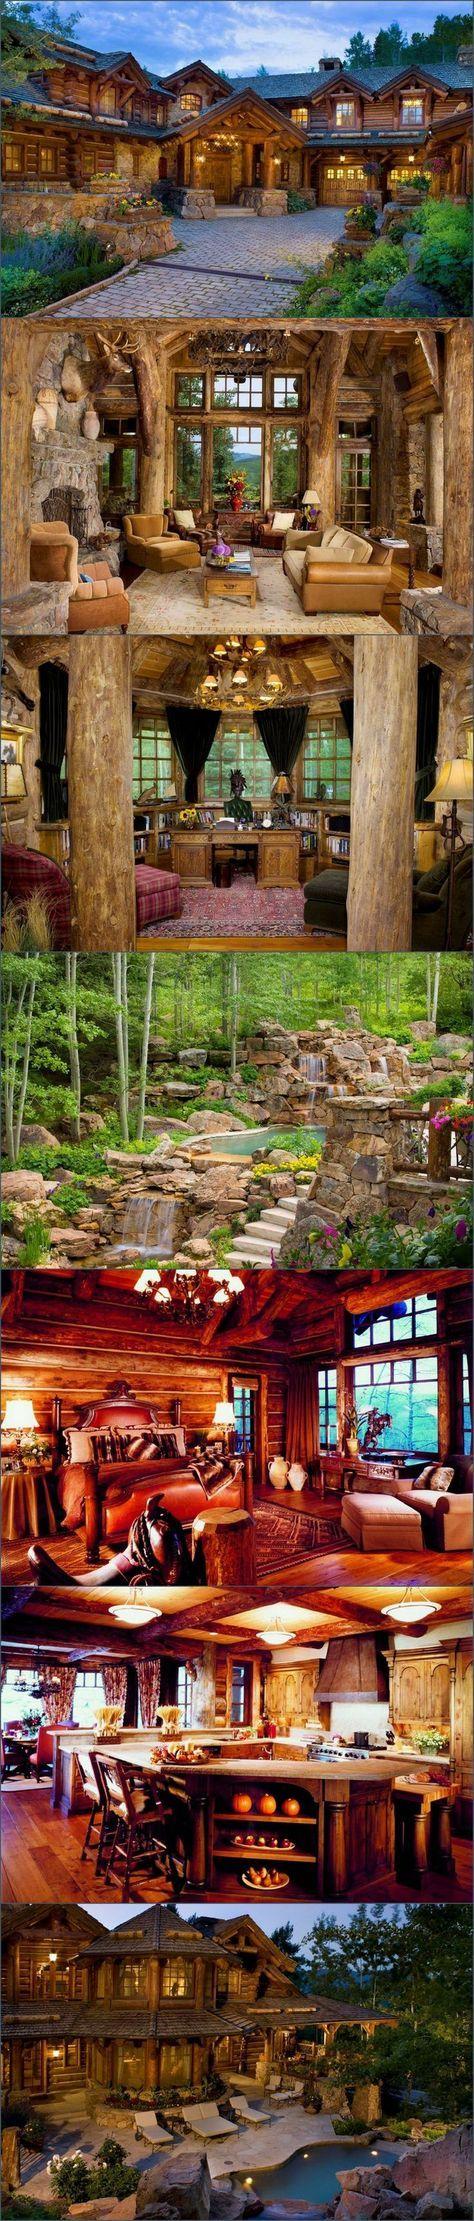 Strawberry Park Lodge - Beaver Creek,Colorado - Style Estate -